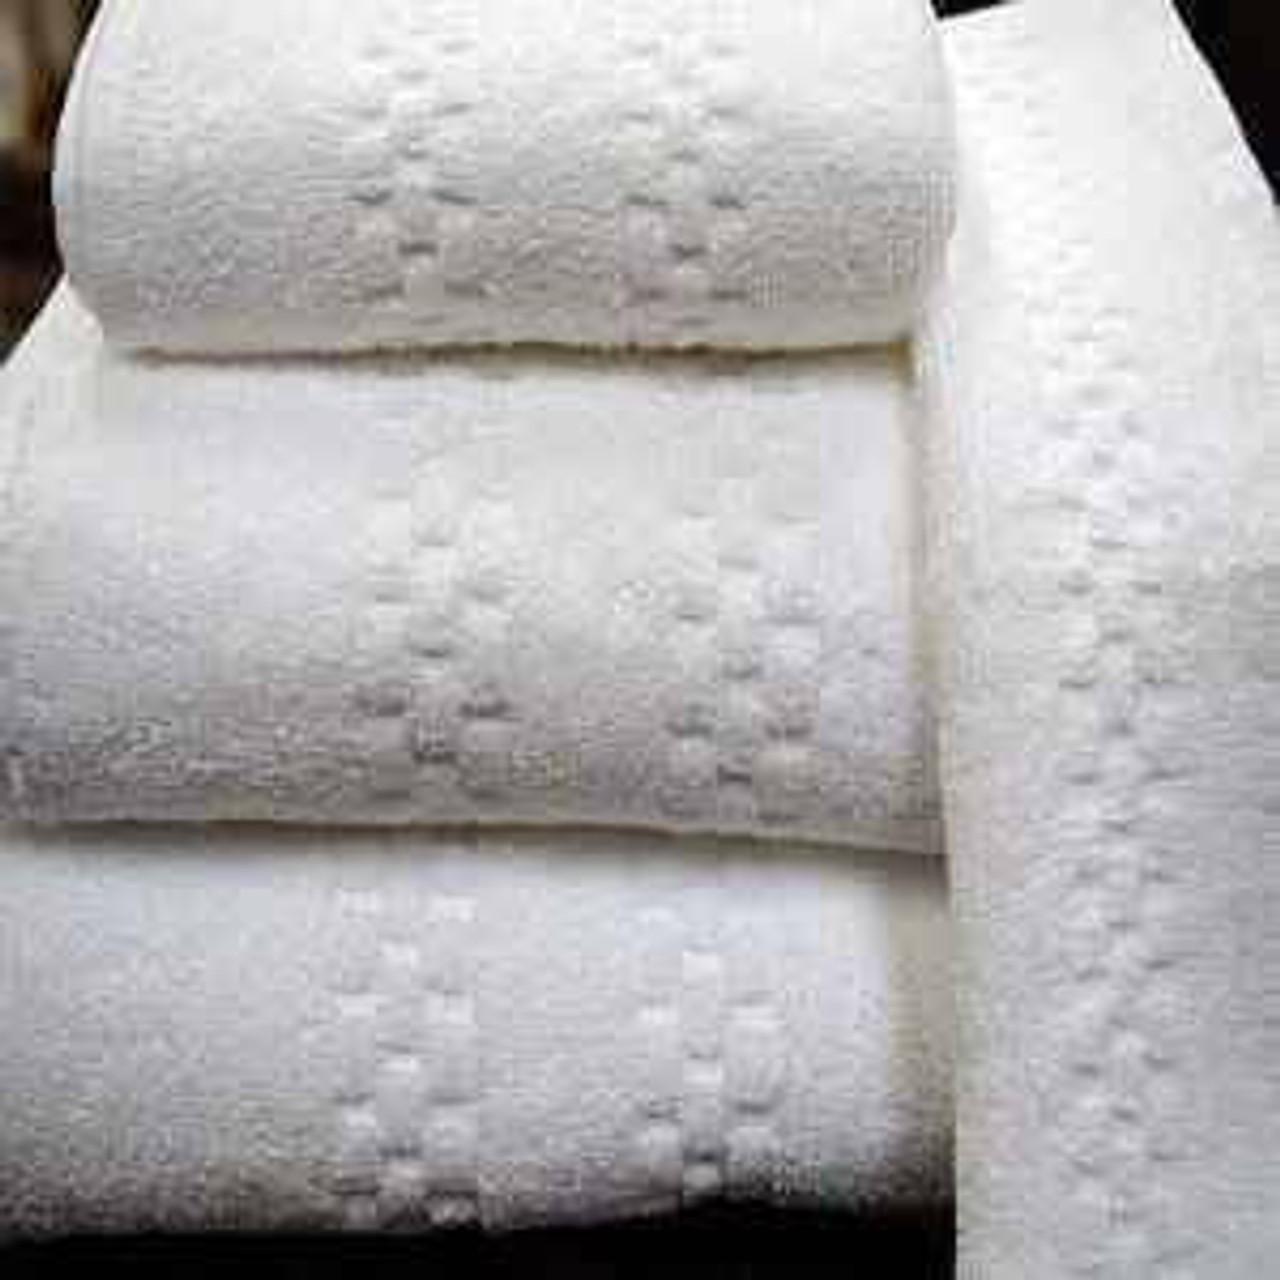 Ganesh Mills or Oxford Super Blend Ganesh Mills or Oxford Viceroy Pool Towels or Pack of 2 DZ